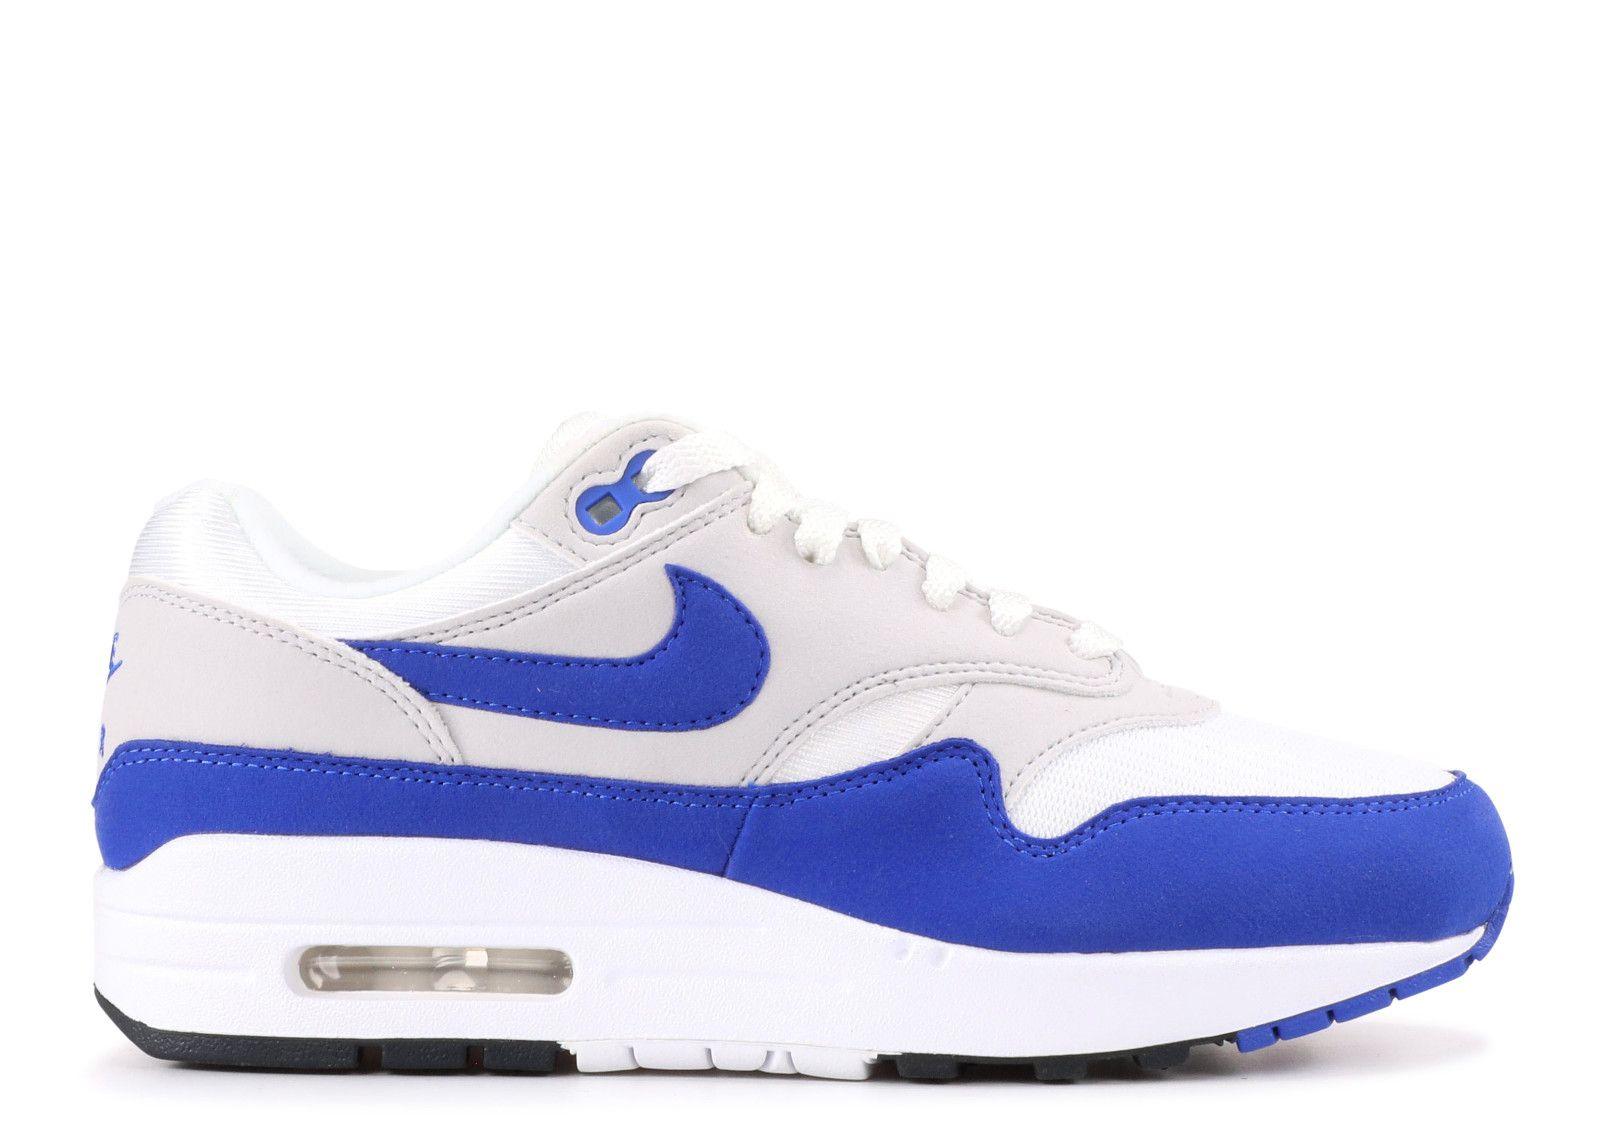 best sneakers 31774 cf88c Buy Nike Air Max 1 Anniversary White Game Royal Neutral Grey Trainers UK  Store